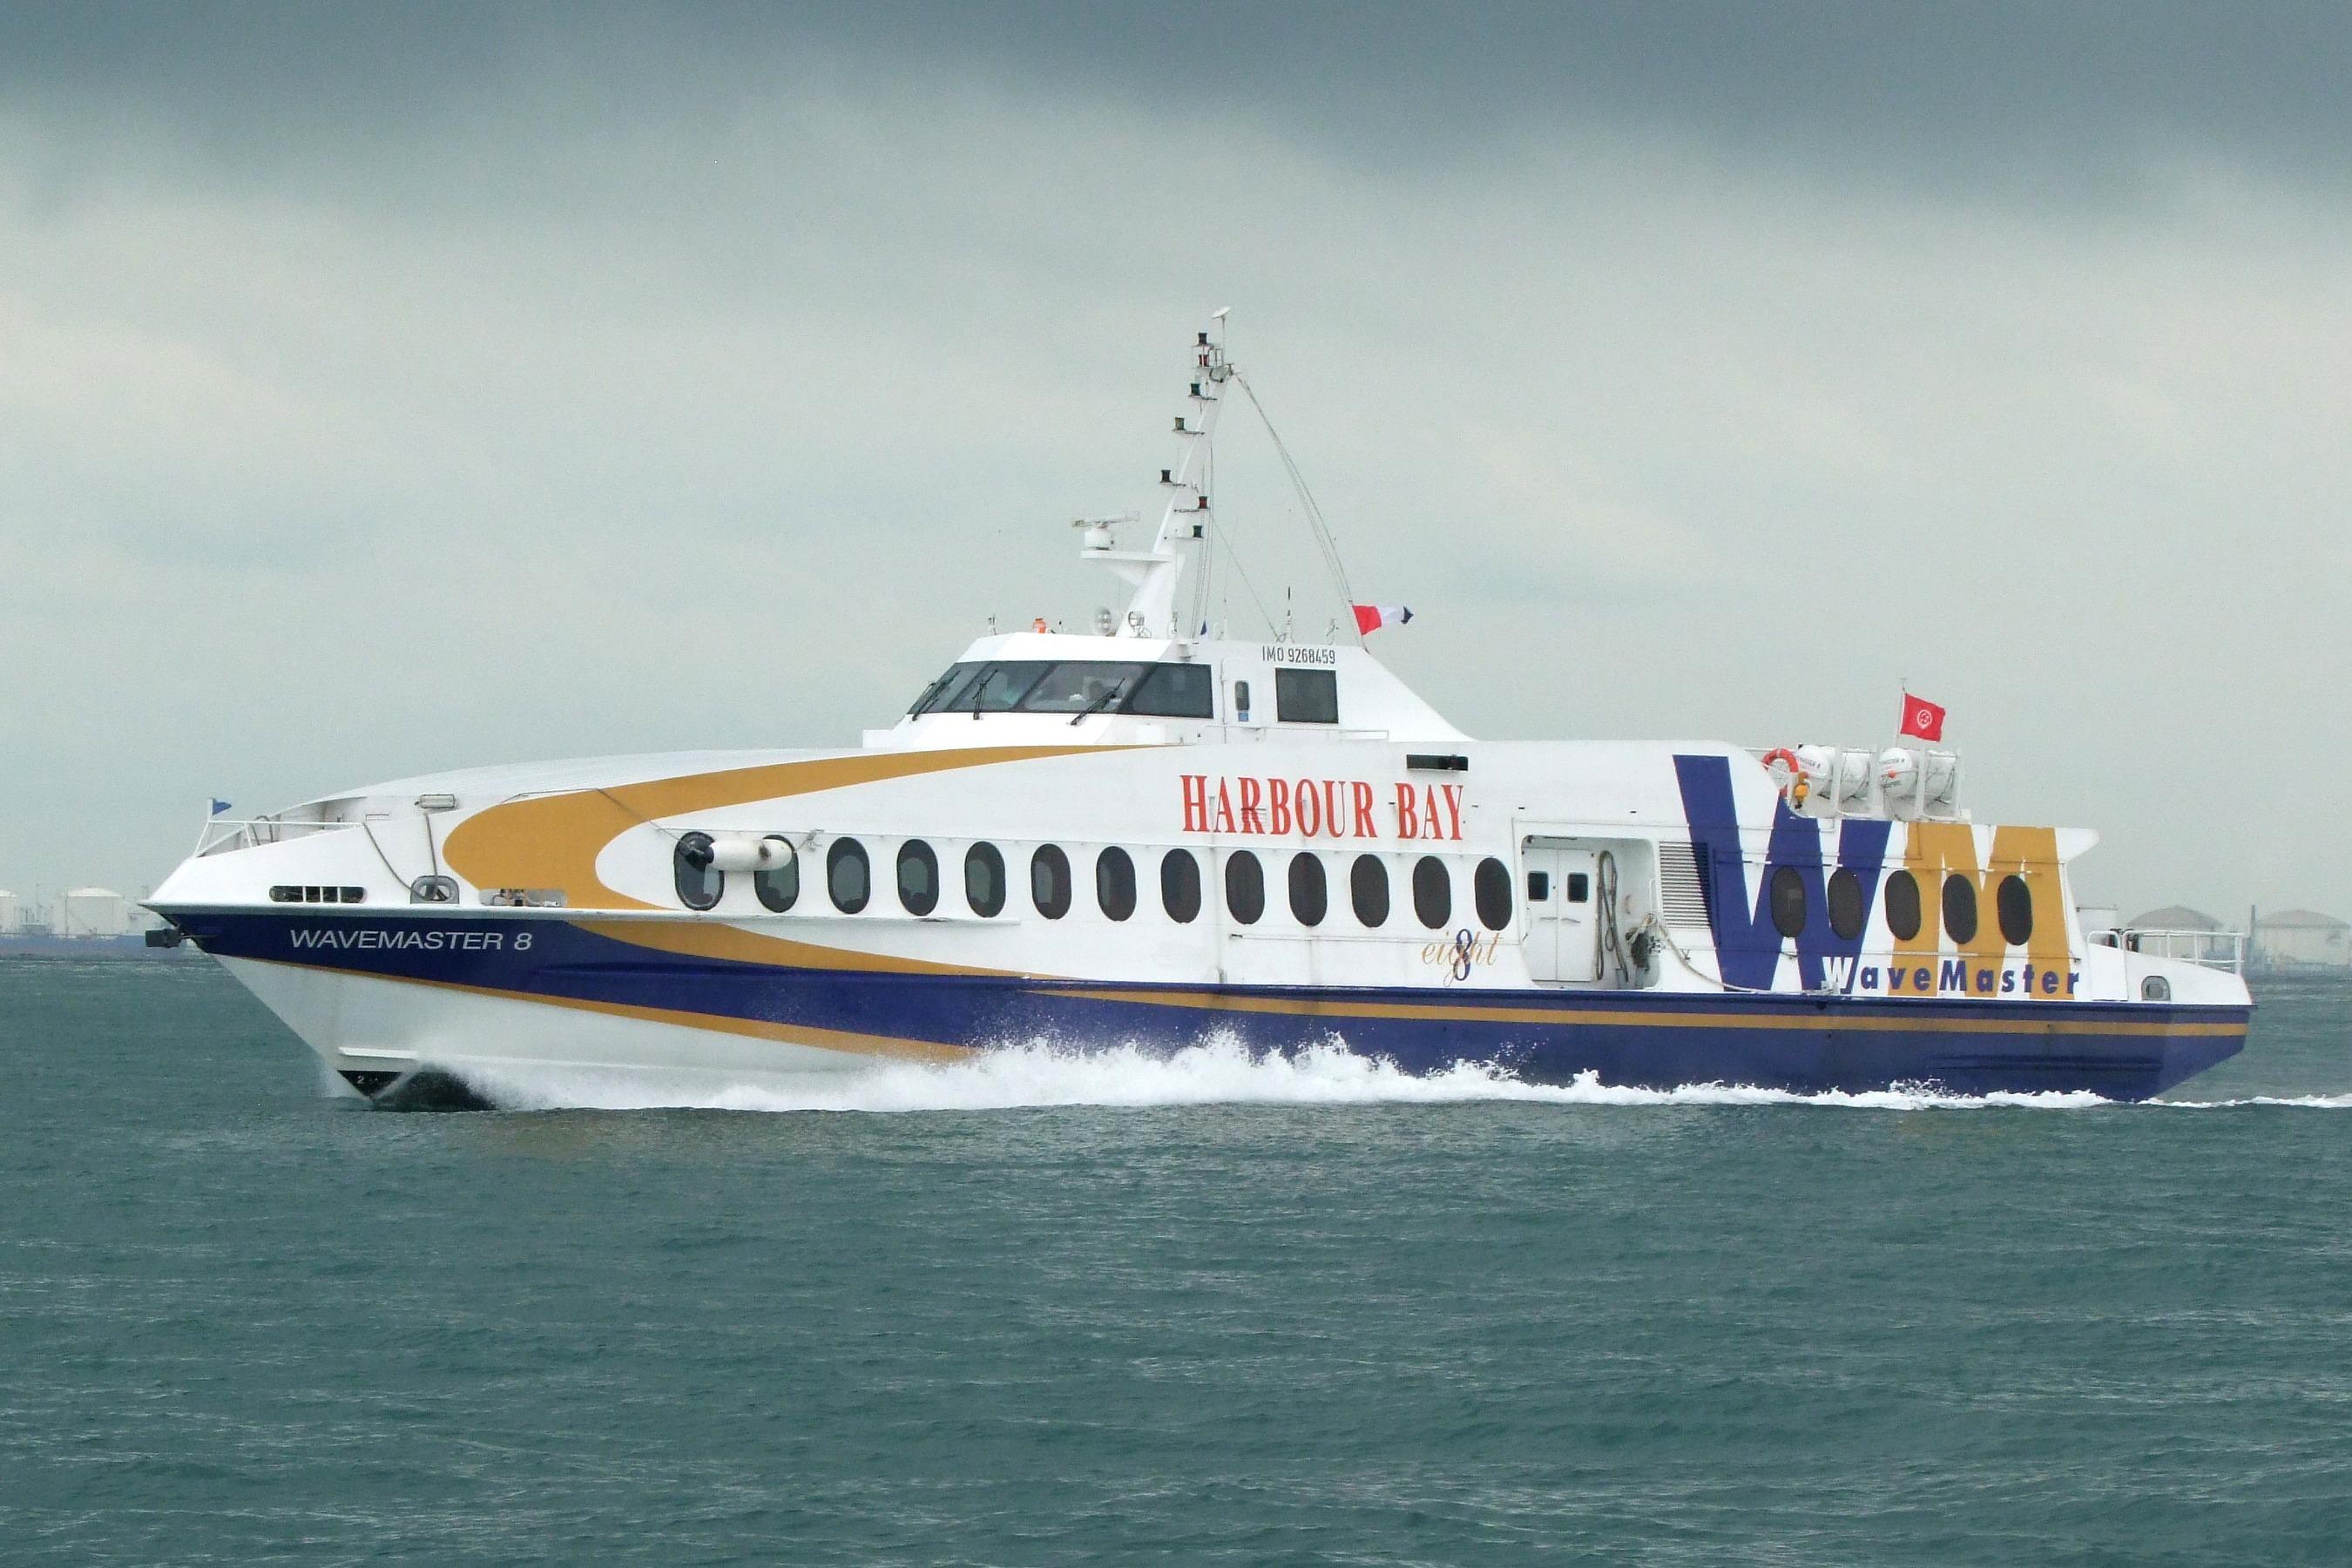 Kapal Harbour Bay